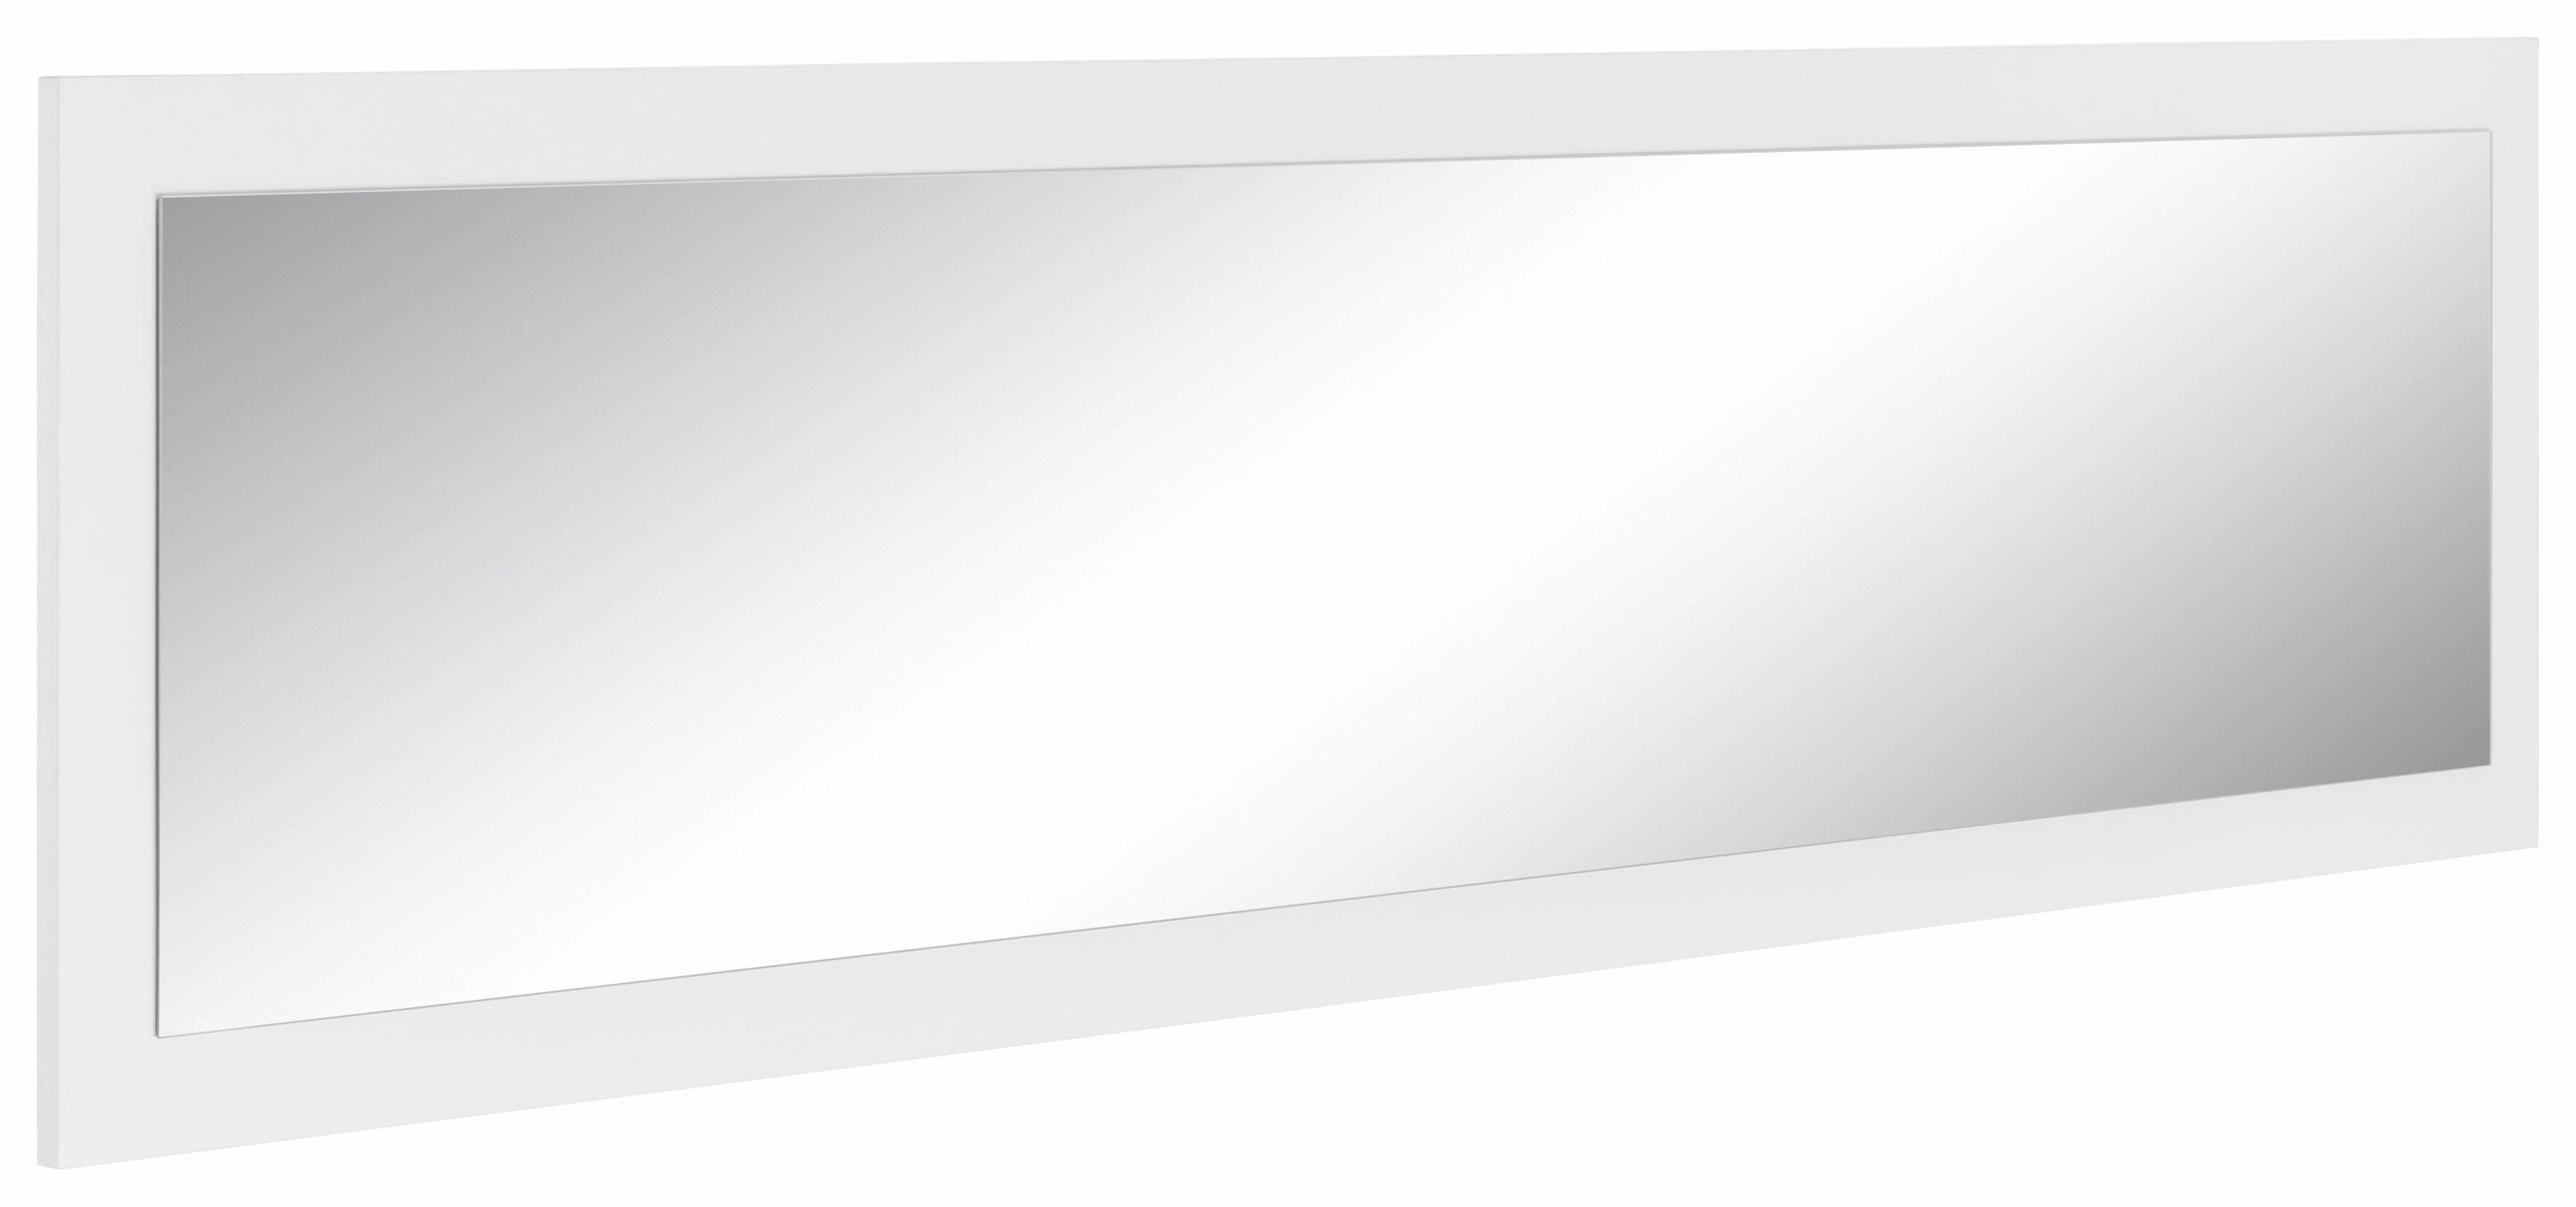 borchardt Möbel Spiegel, 166 cm breed bij OTTO online kopen